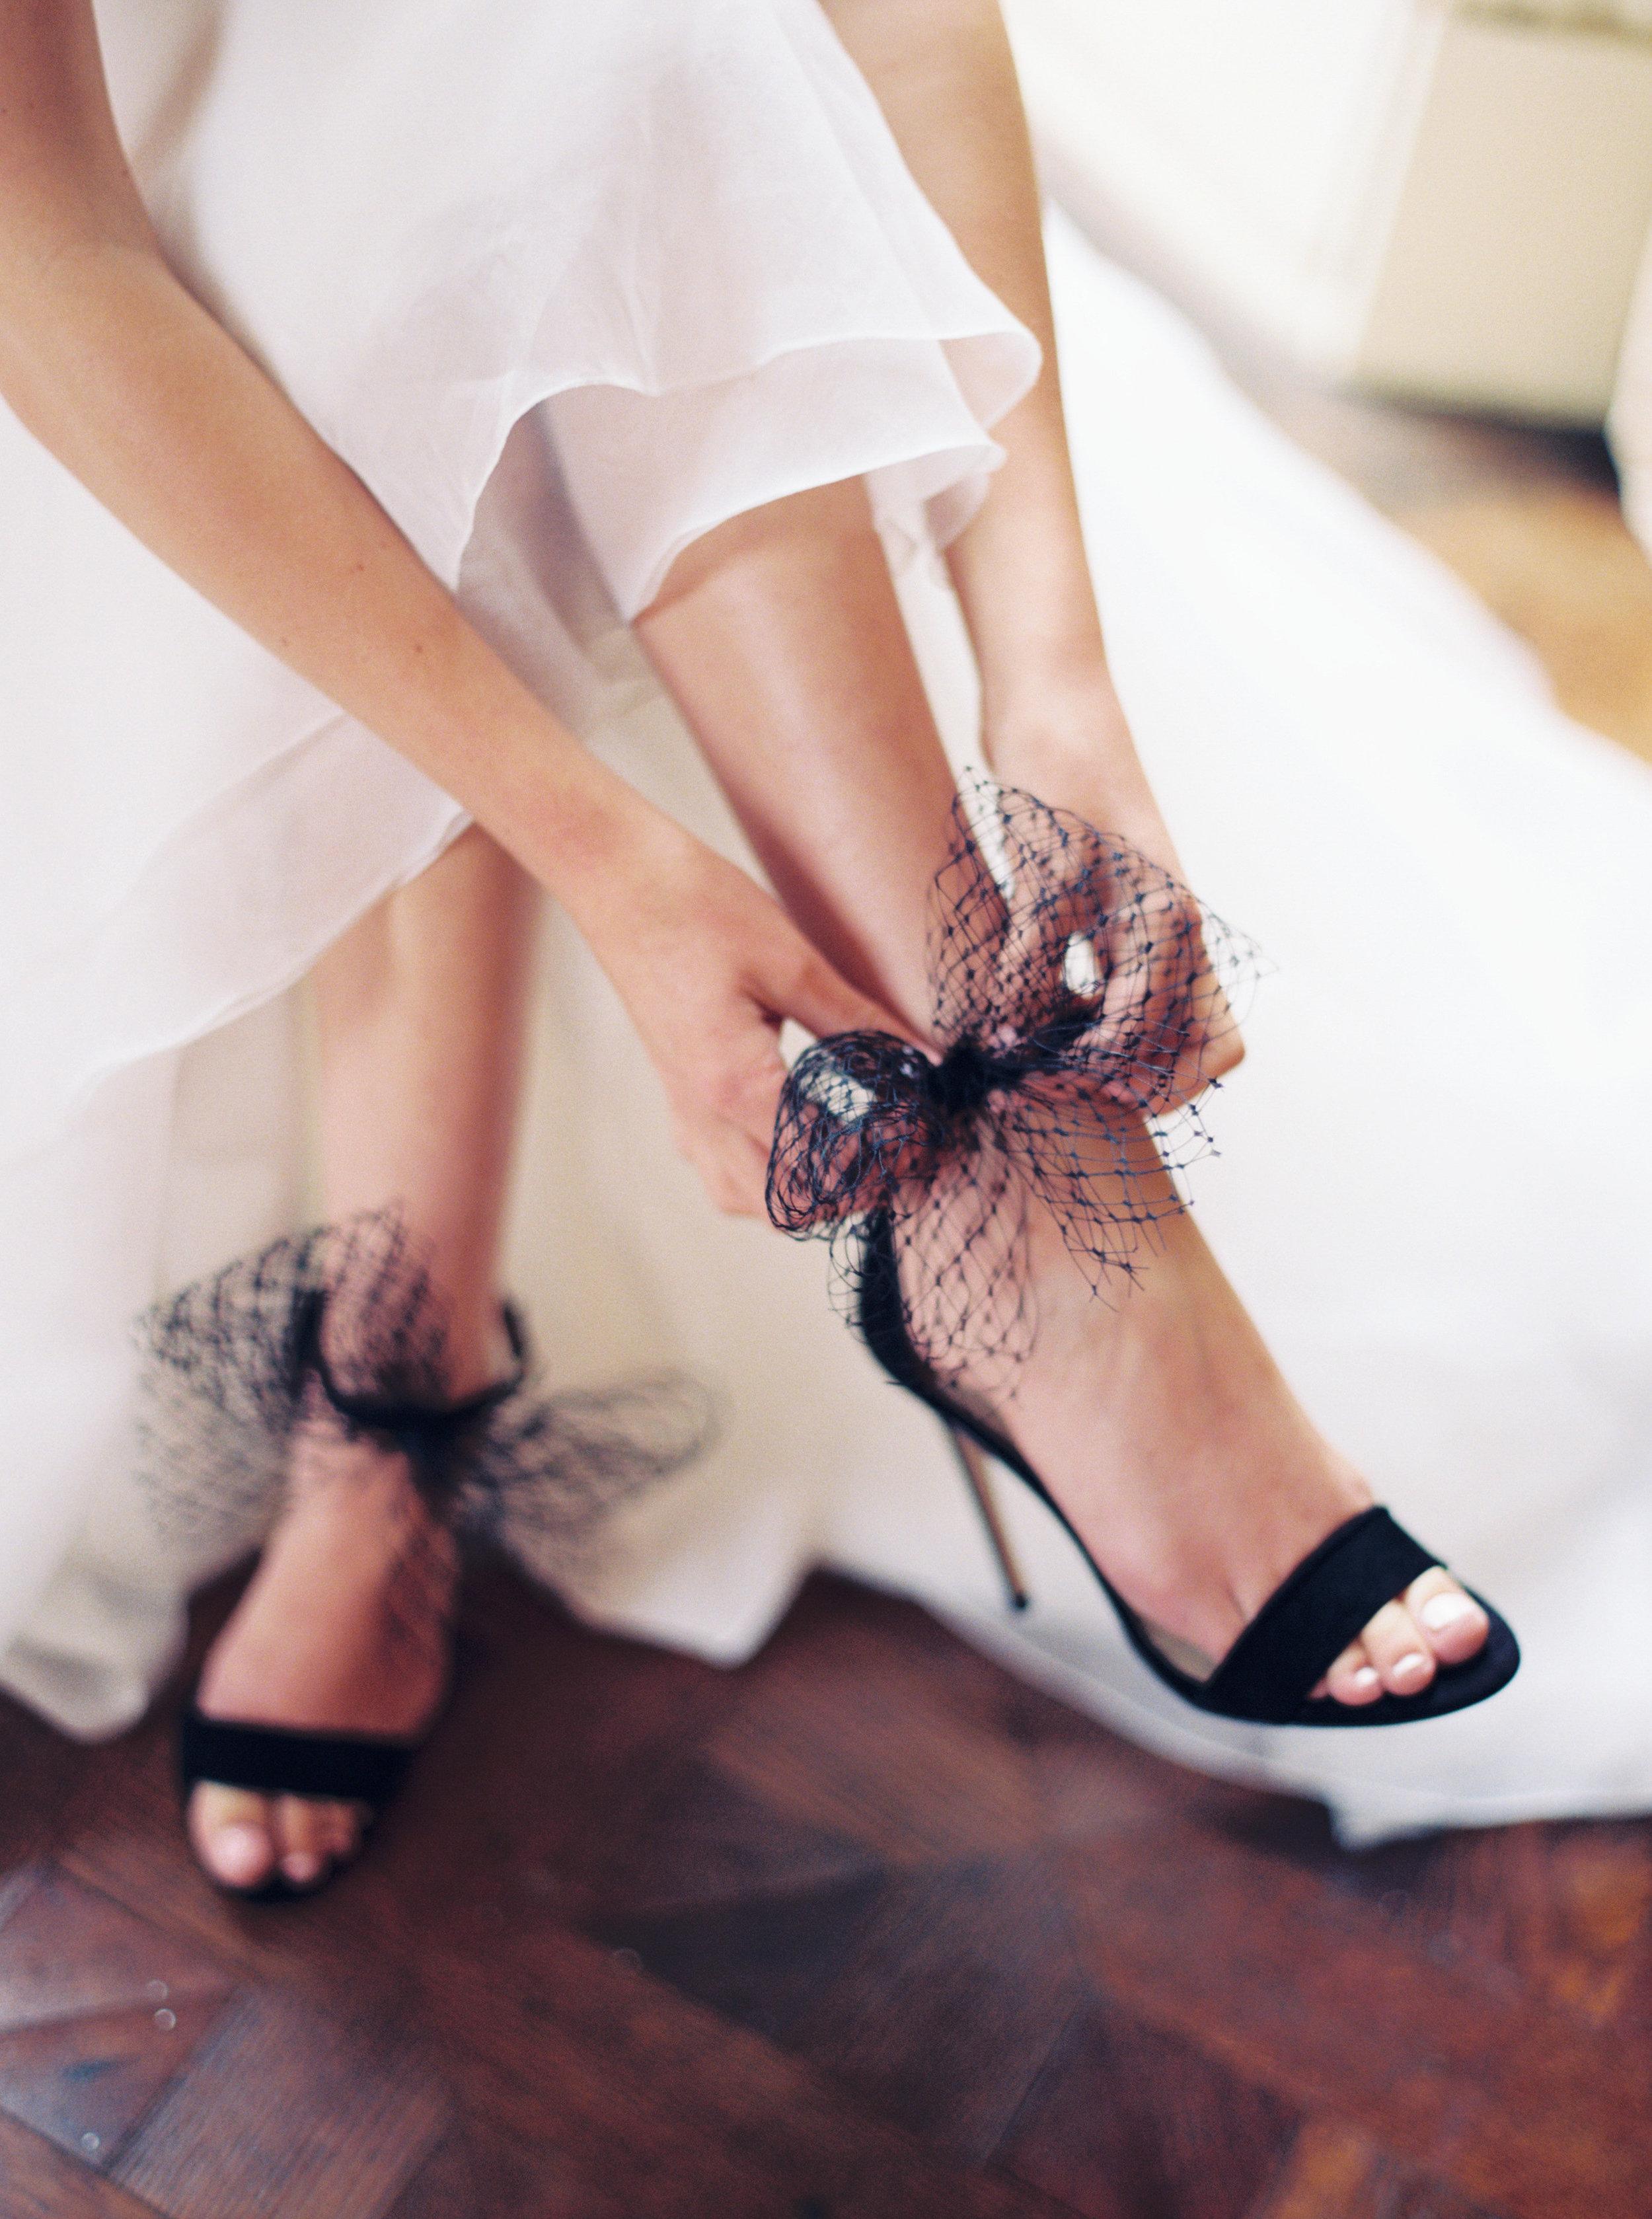 Luxury Wedding Planner UK | Complete Wedding Planning & Styling | White Wedding English Country House Wedding Monochrome Wedding Neutral Wedding Inspiration | Nicole Colwell Photography 0153.jpg